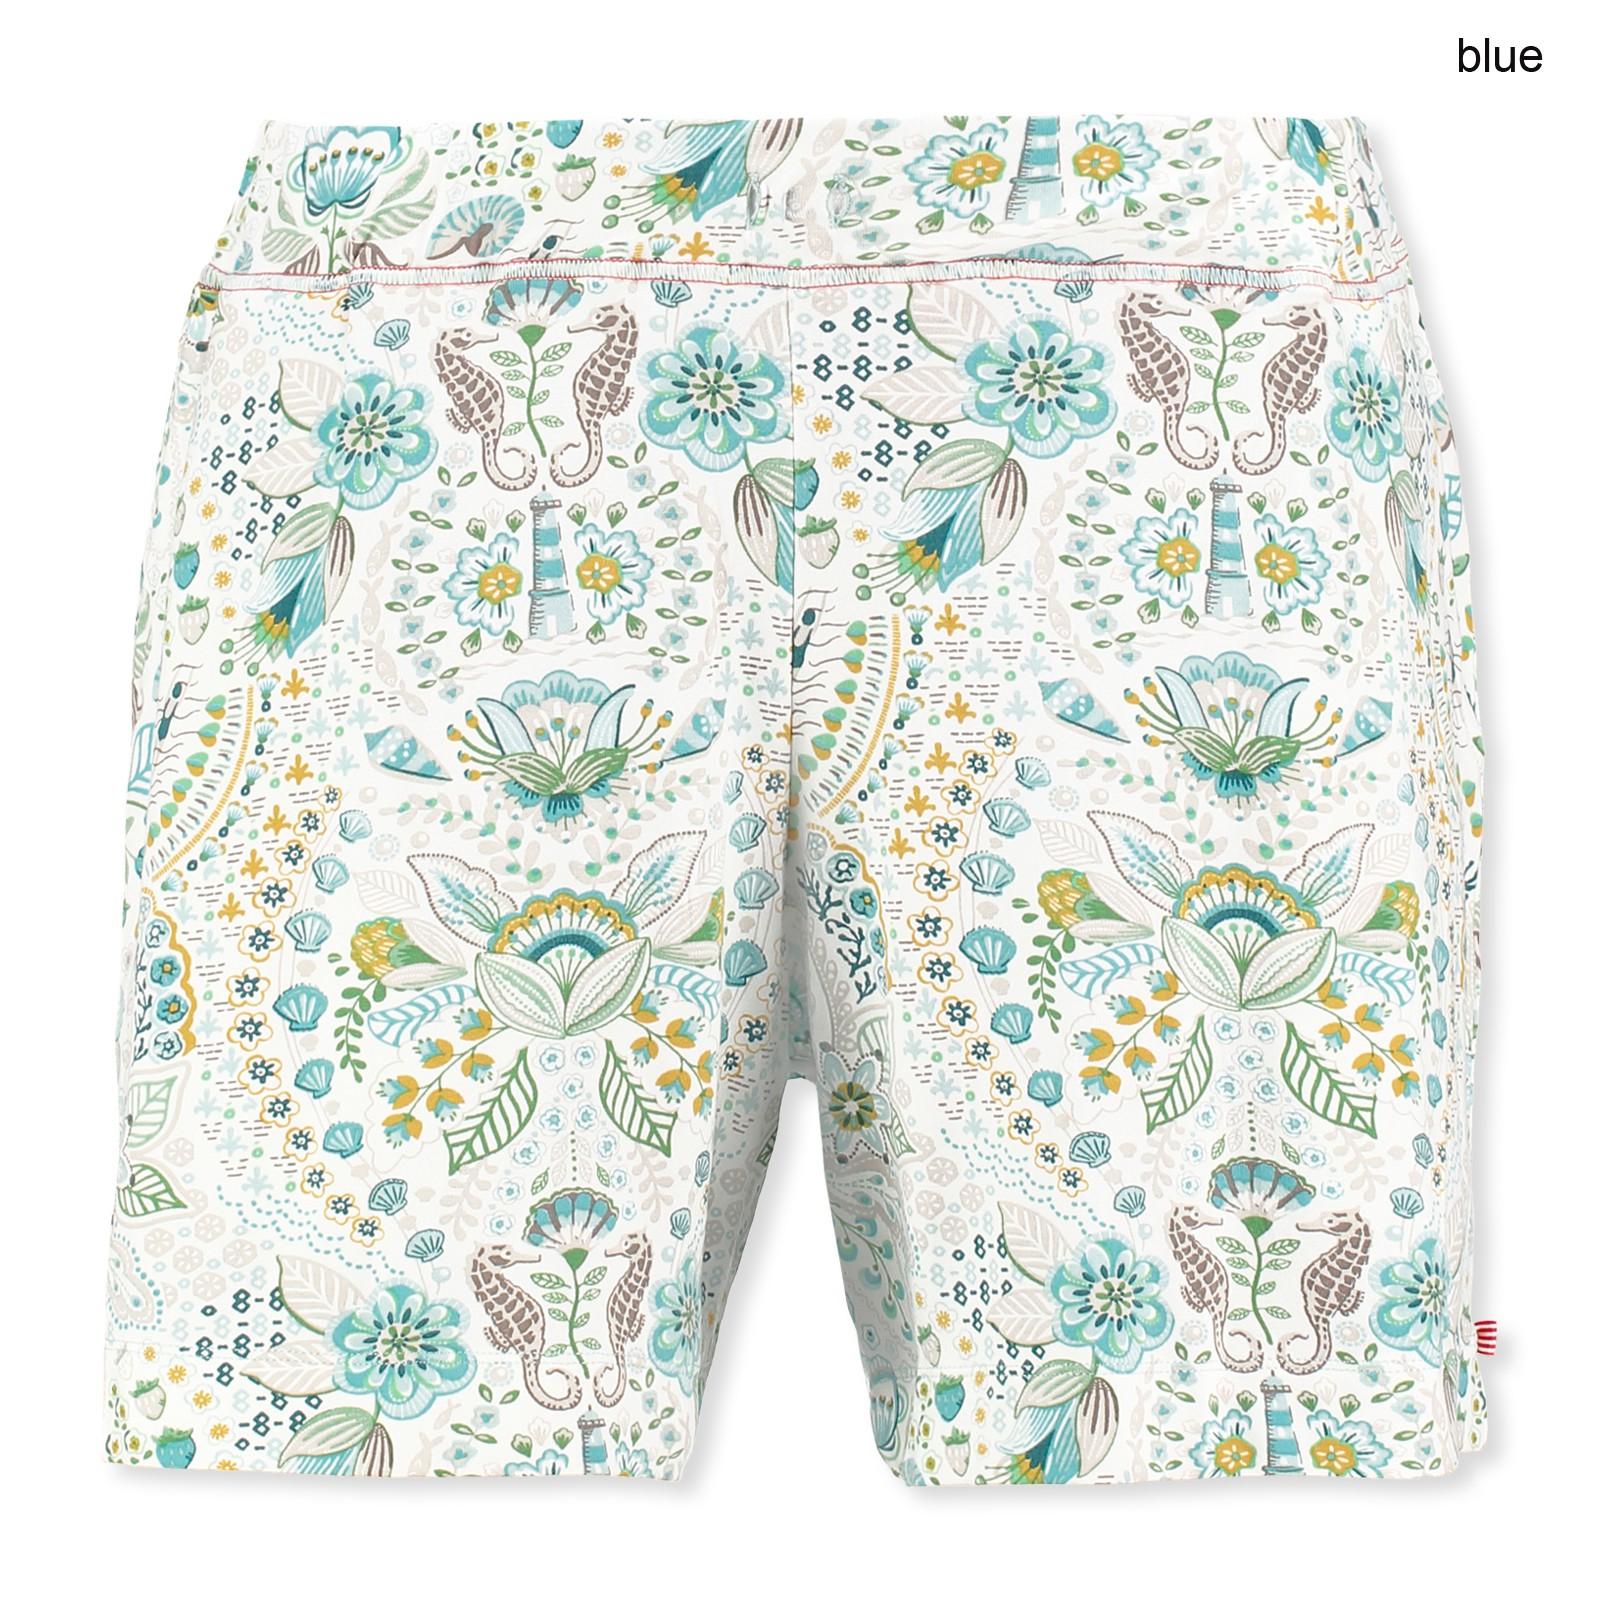 PiP Studio Damen Pyjama Hose kurz Bob Sea Stitch S M L XL 260553 in blue